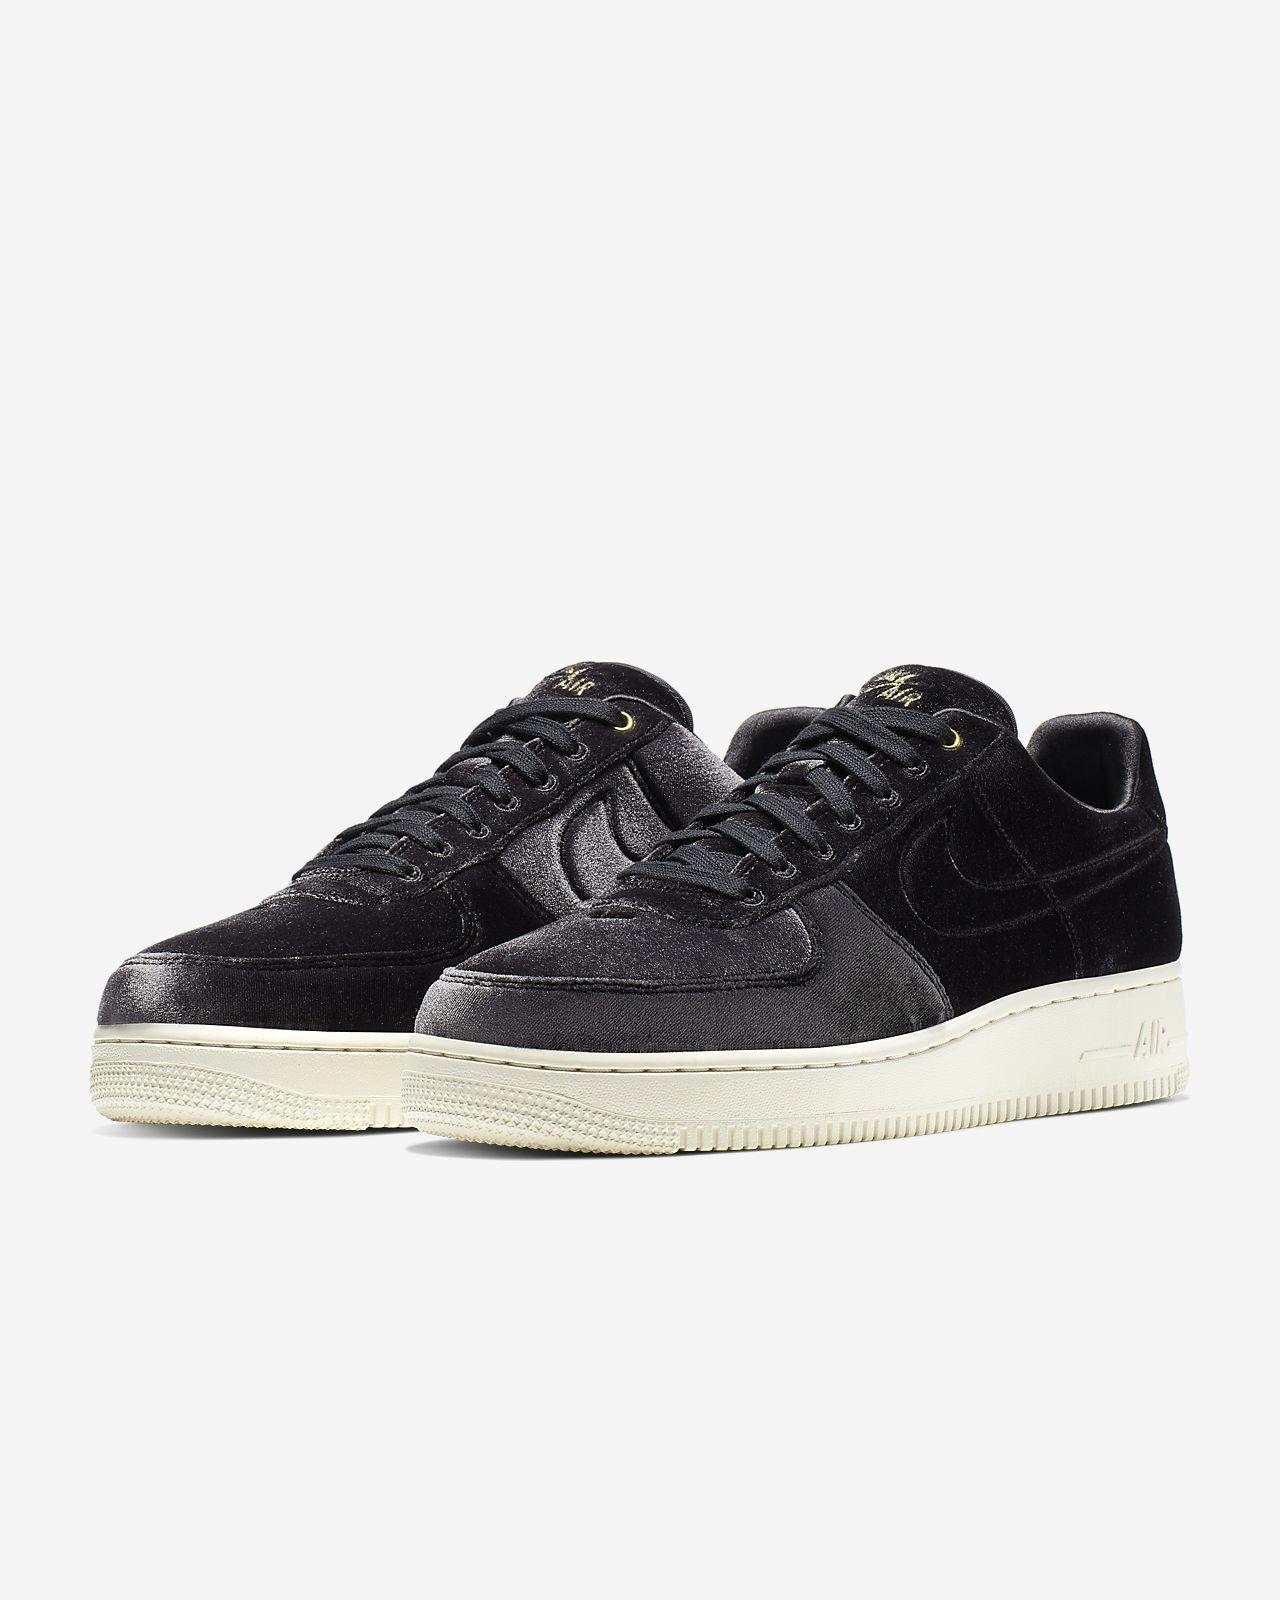 061ce8d3dd9a Ανδρικό παπούτσι Nike Air Force 1  07 Premium 3. Nike.com GR